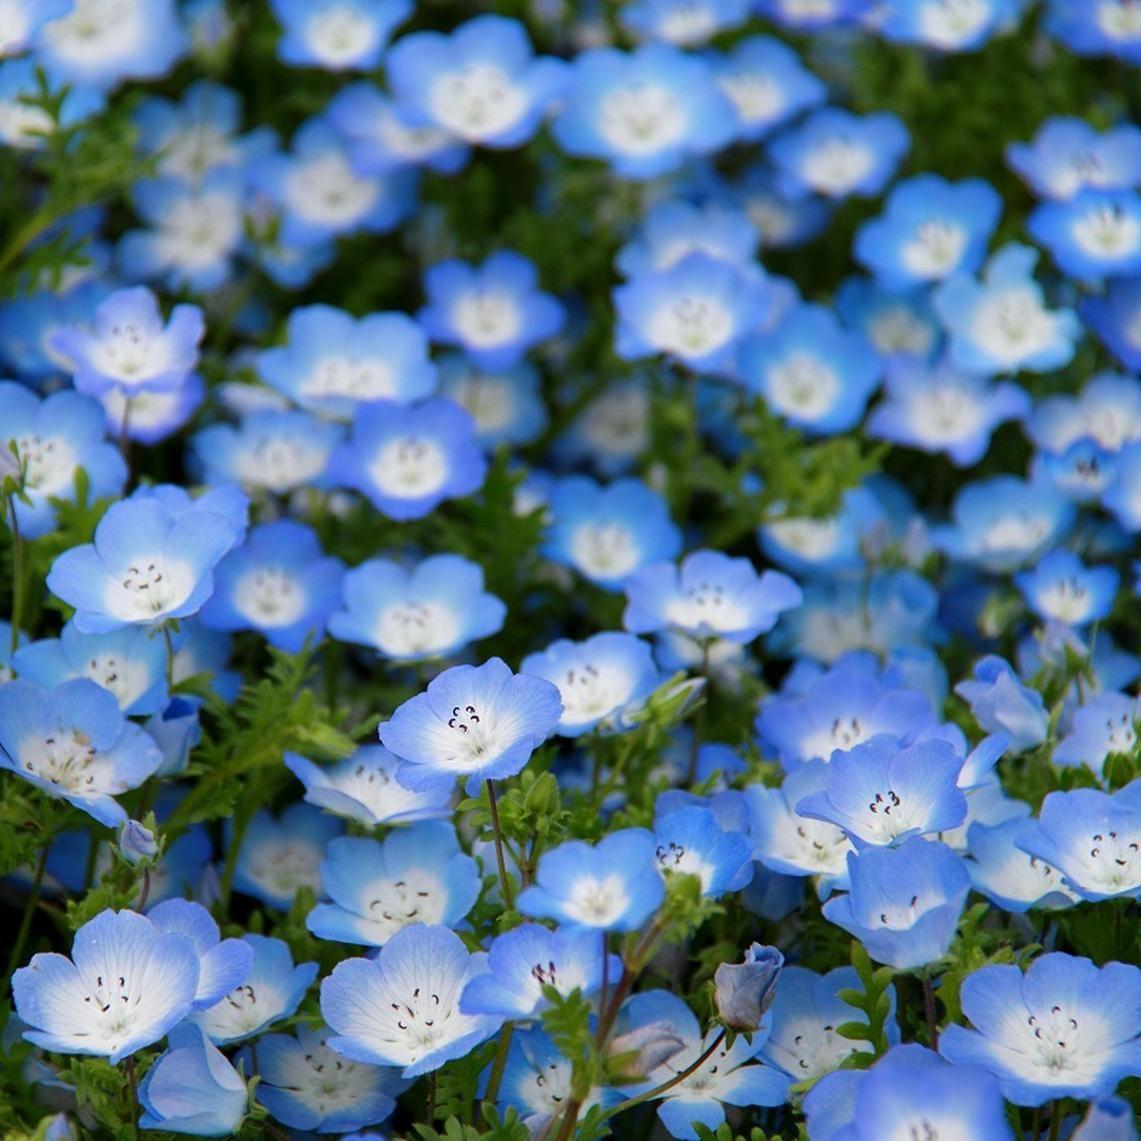 Baby blue eyes seeds blue flowers garden flower seeds